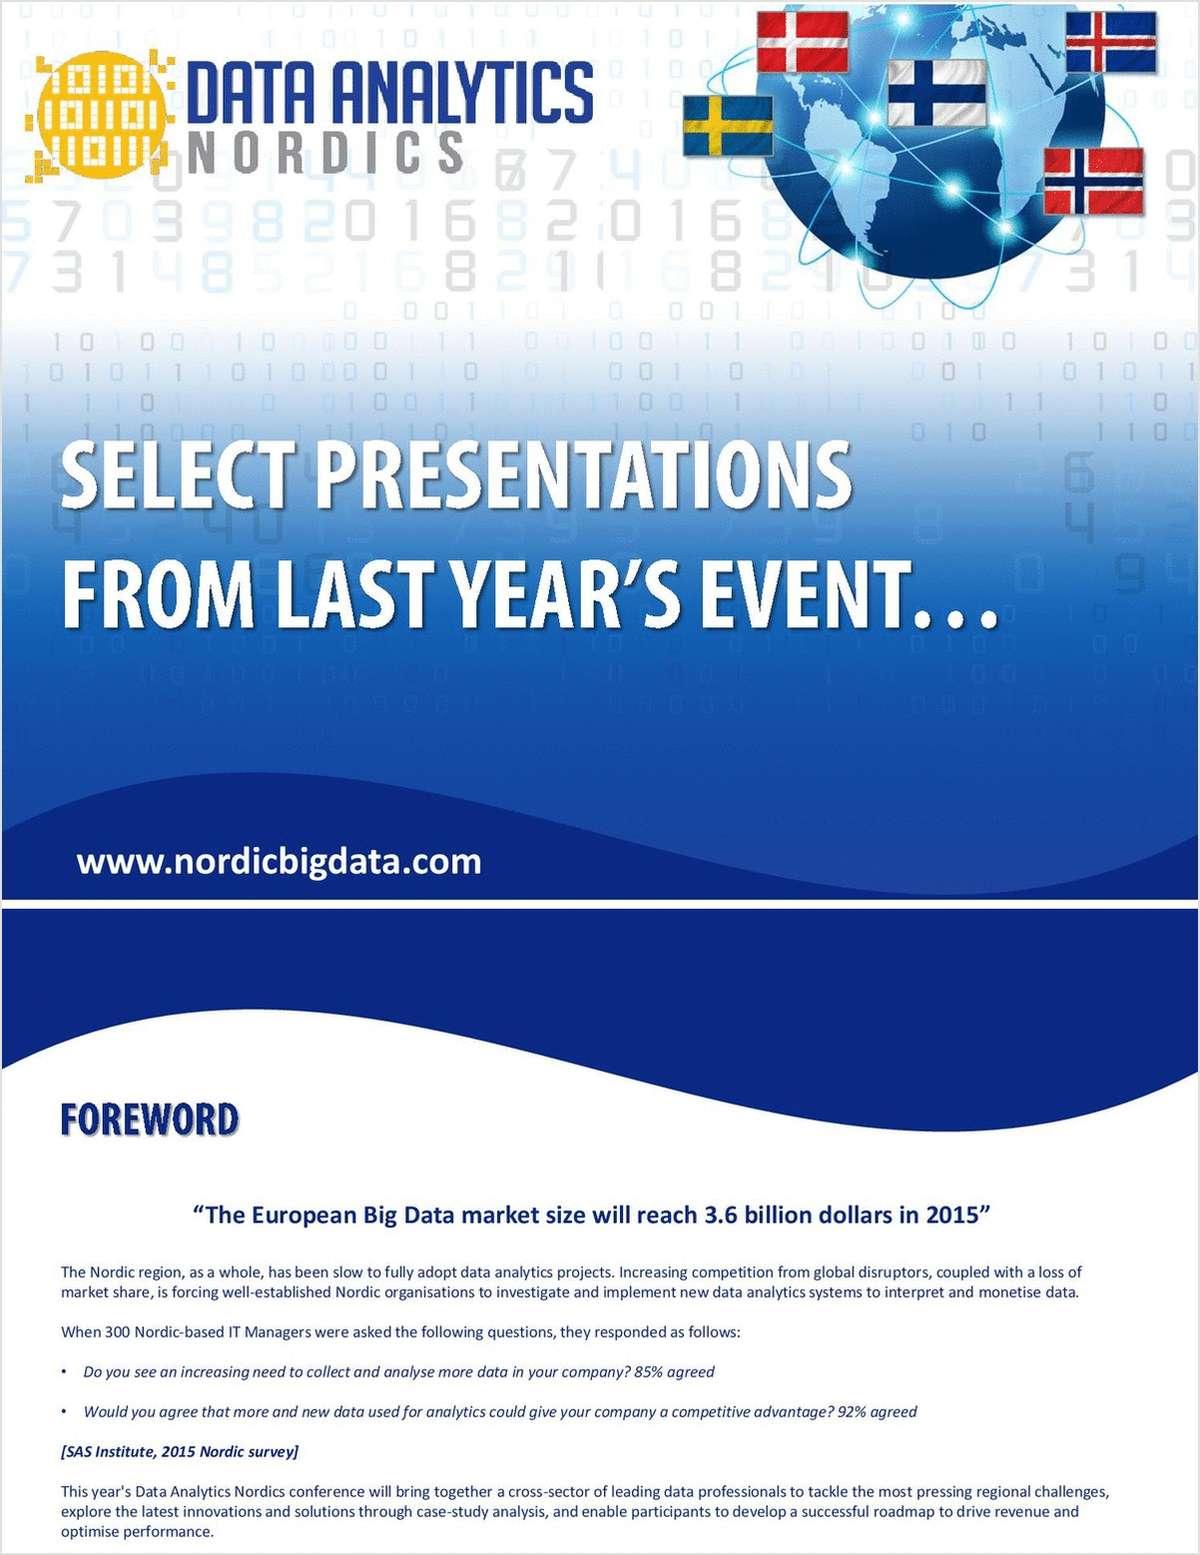 Select Presentations from Data Analytics Nordics